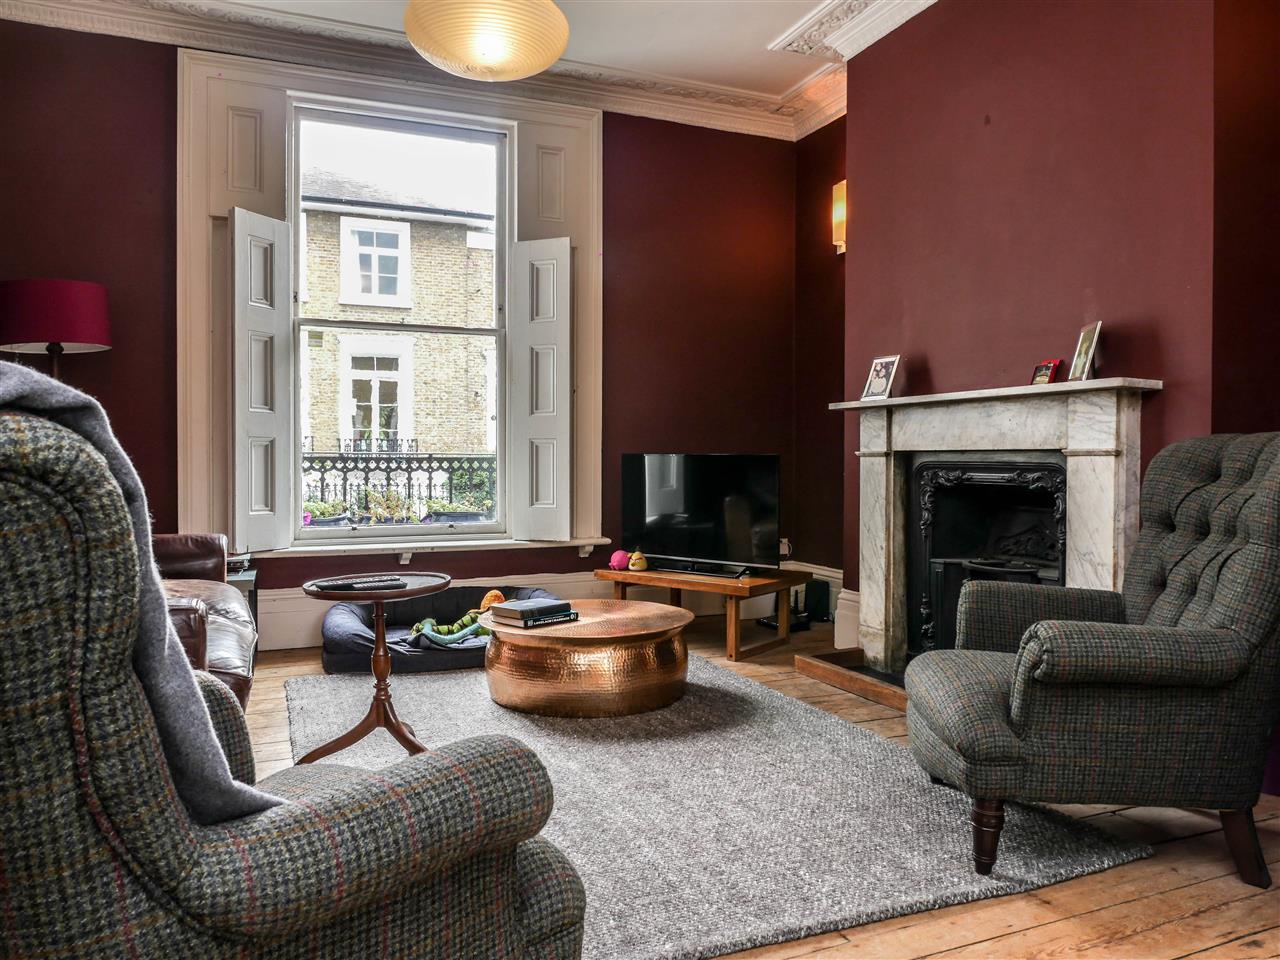 4 bed terraced to rent in Tavistock Terrace, London, N19